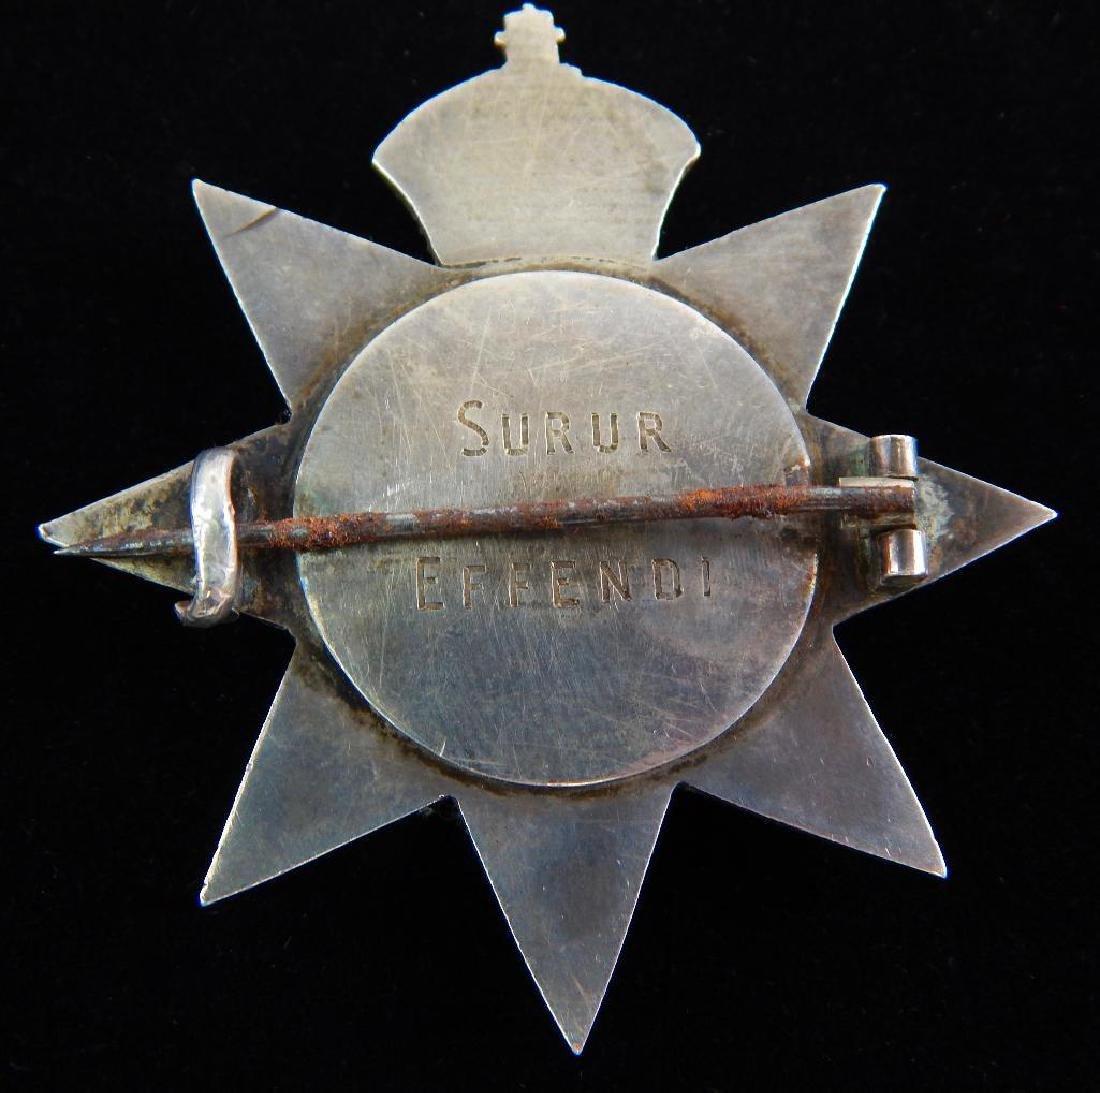 Exremely Rare Ugnada Star British Medal Awarded to - 2